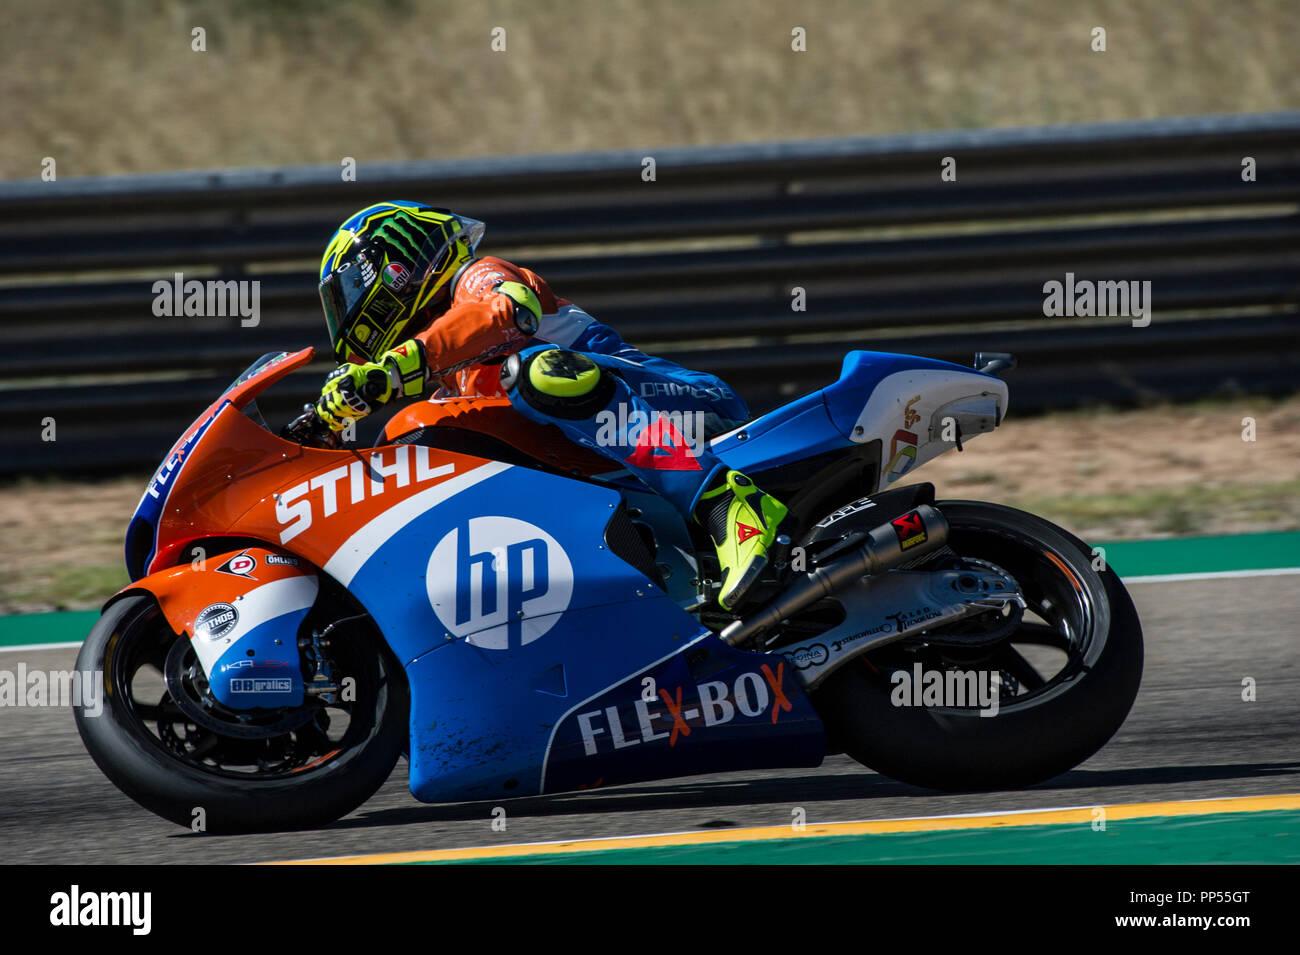 Alcaniz, Spain. 23rd September 2018. Motorcycling MotoGP of Aragon, race day; Moto2 Lorenzo Baldassarri (Pons HP40) in action Credit: Action Plus Sports Images/Alamy Live News - Stock Image